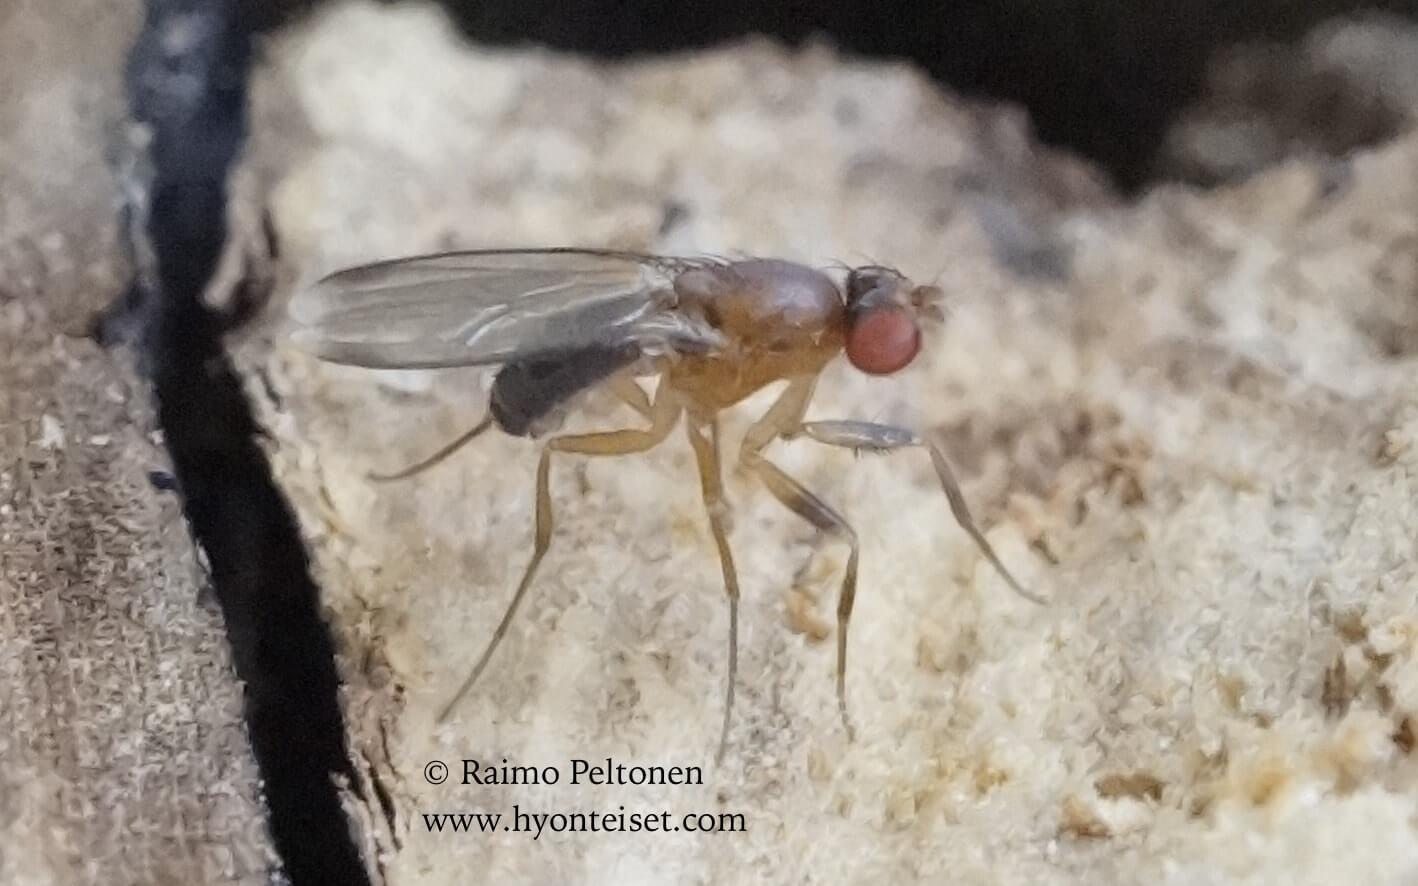 Chymomyza fuscimana (det. Stephane Lebrun), 21.7.2016 Muurame